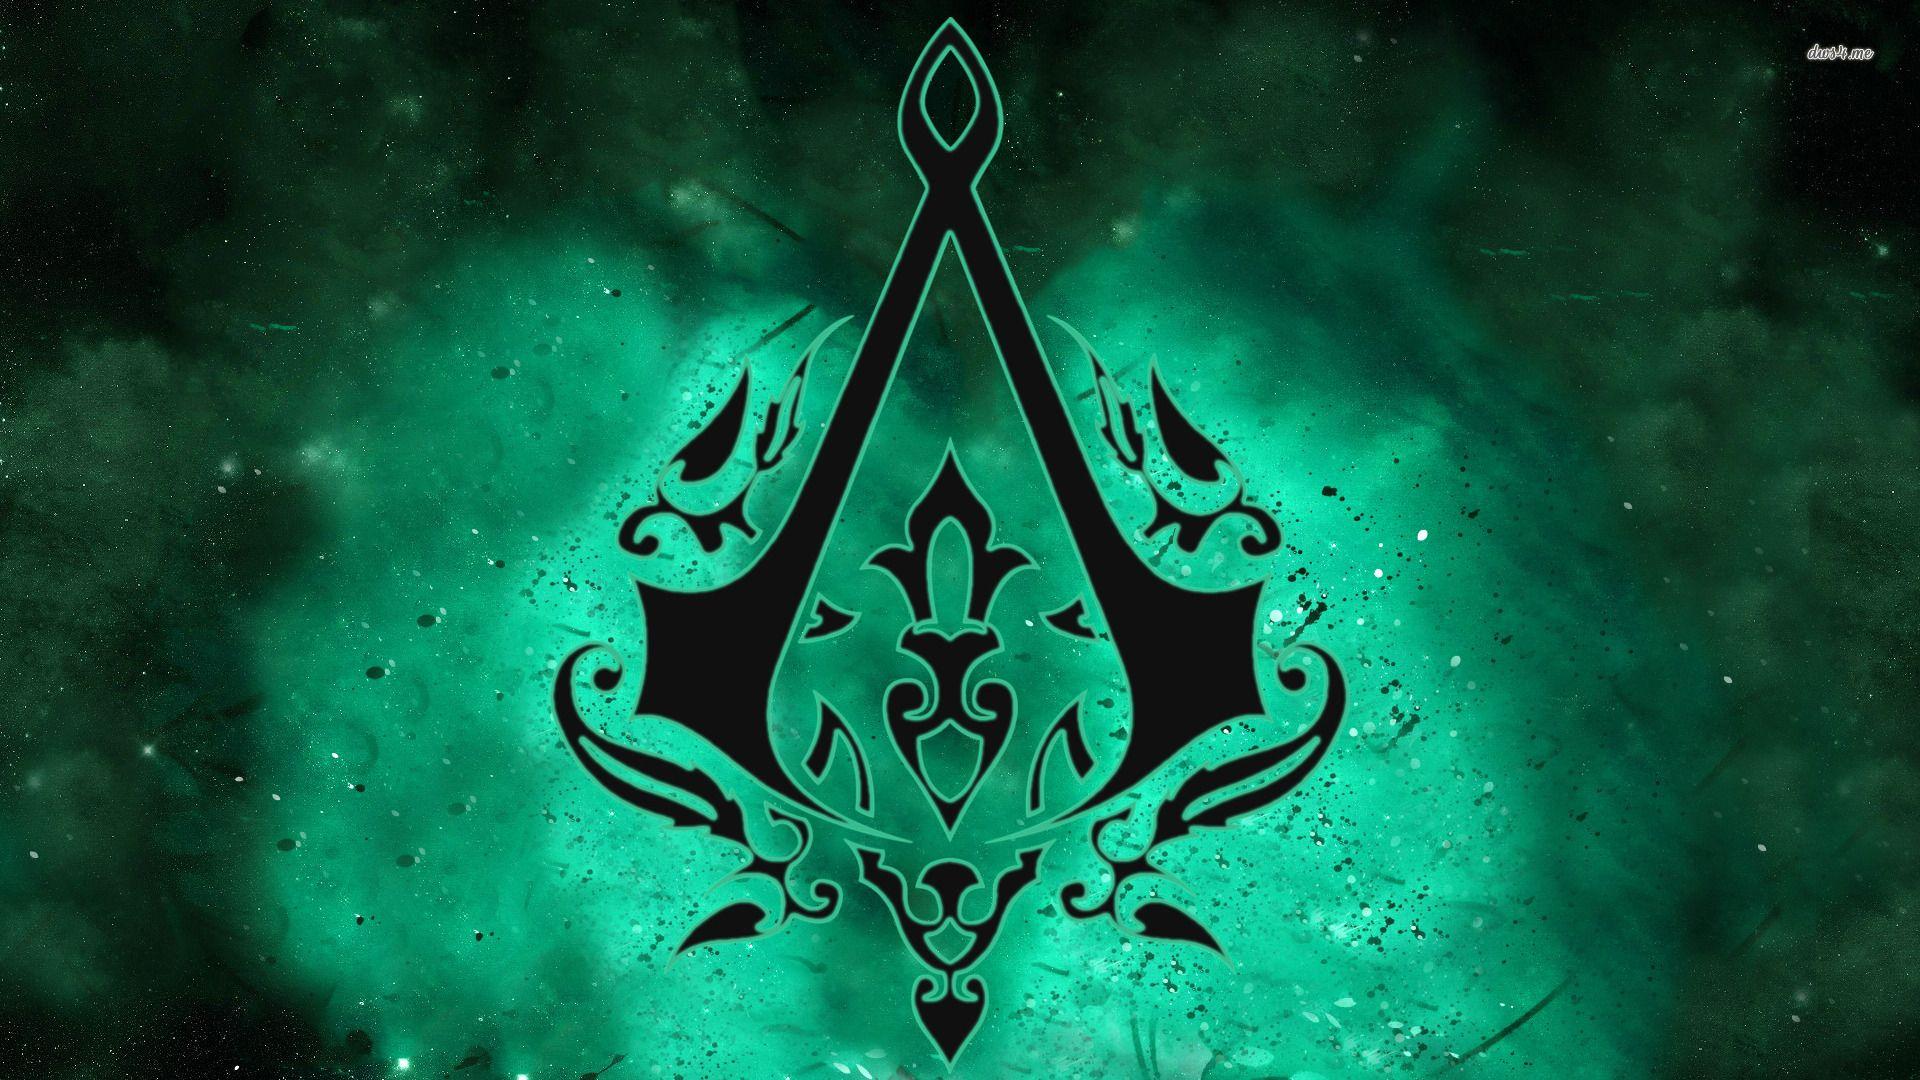 Assassins Creed Symbol Wallpapers Assassins Creed Symbol